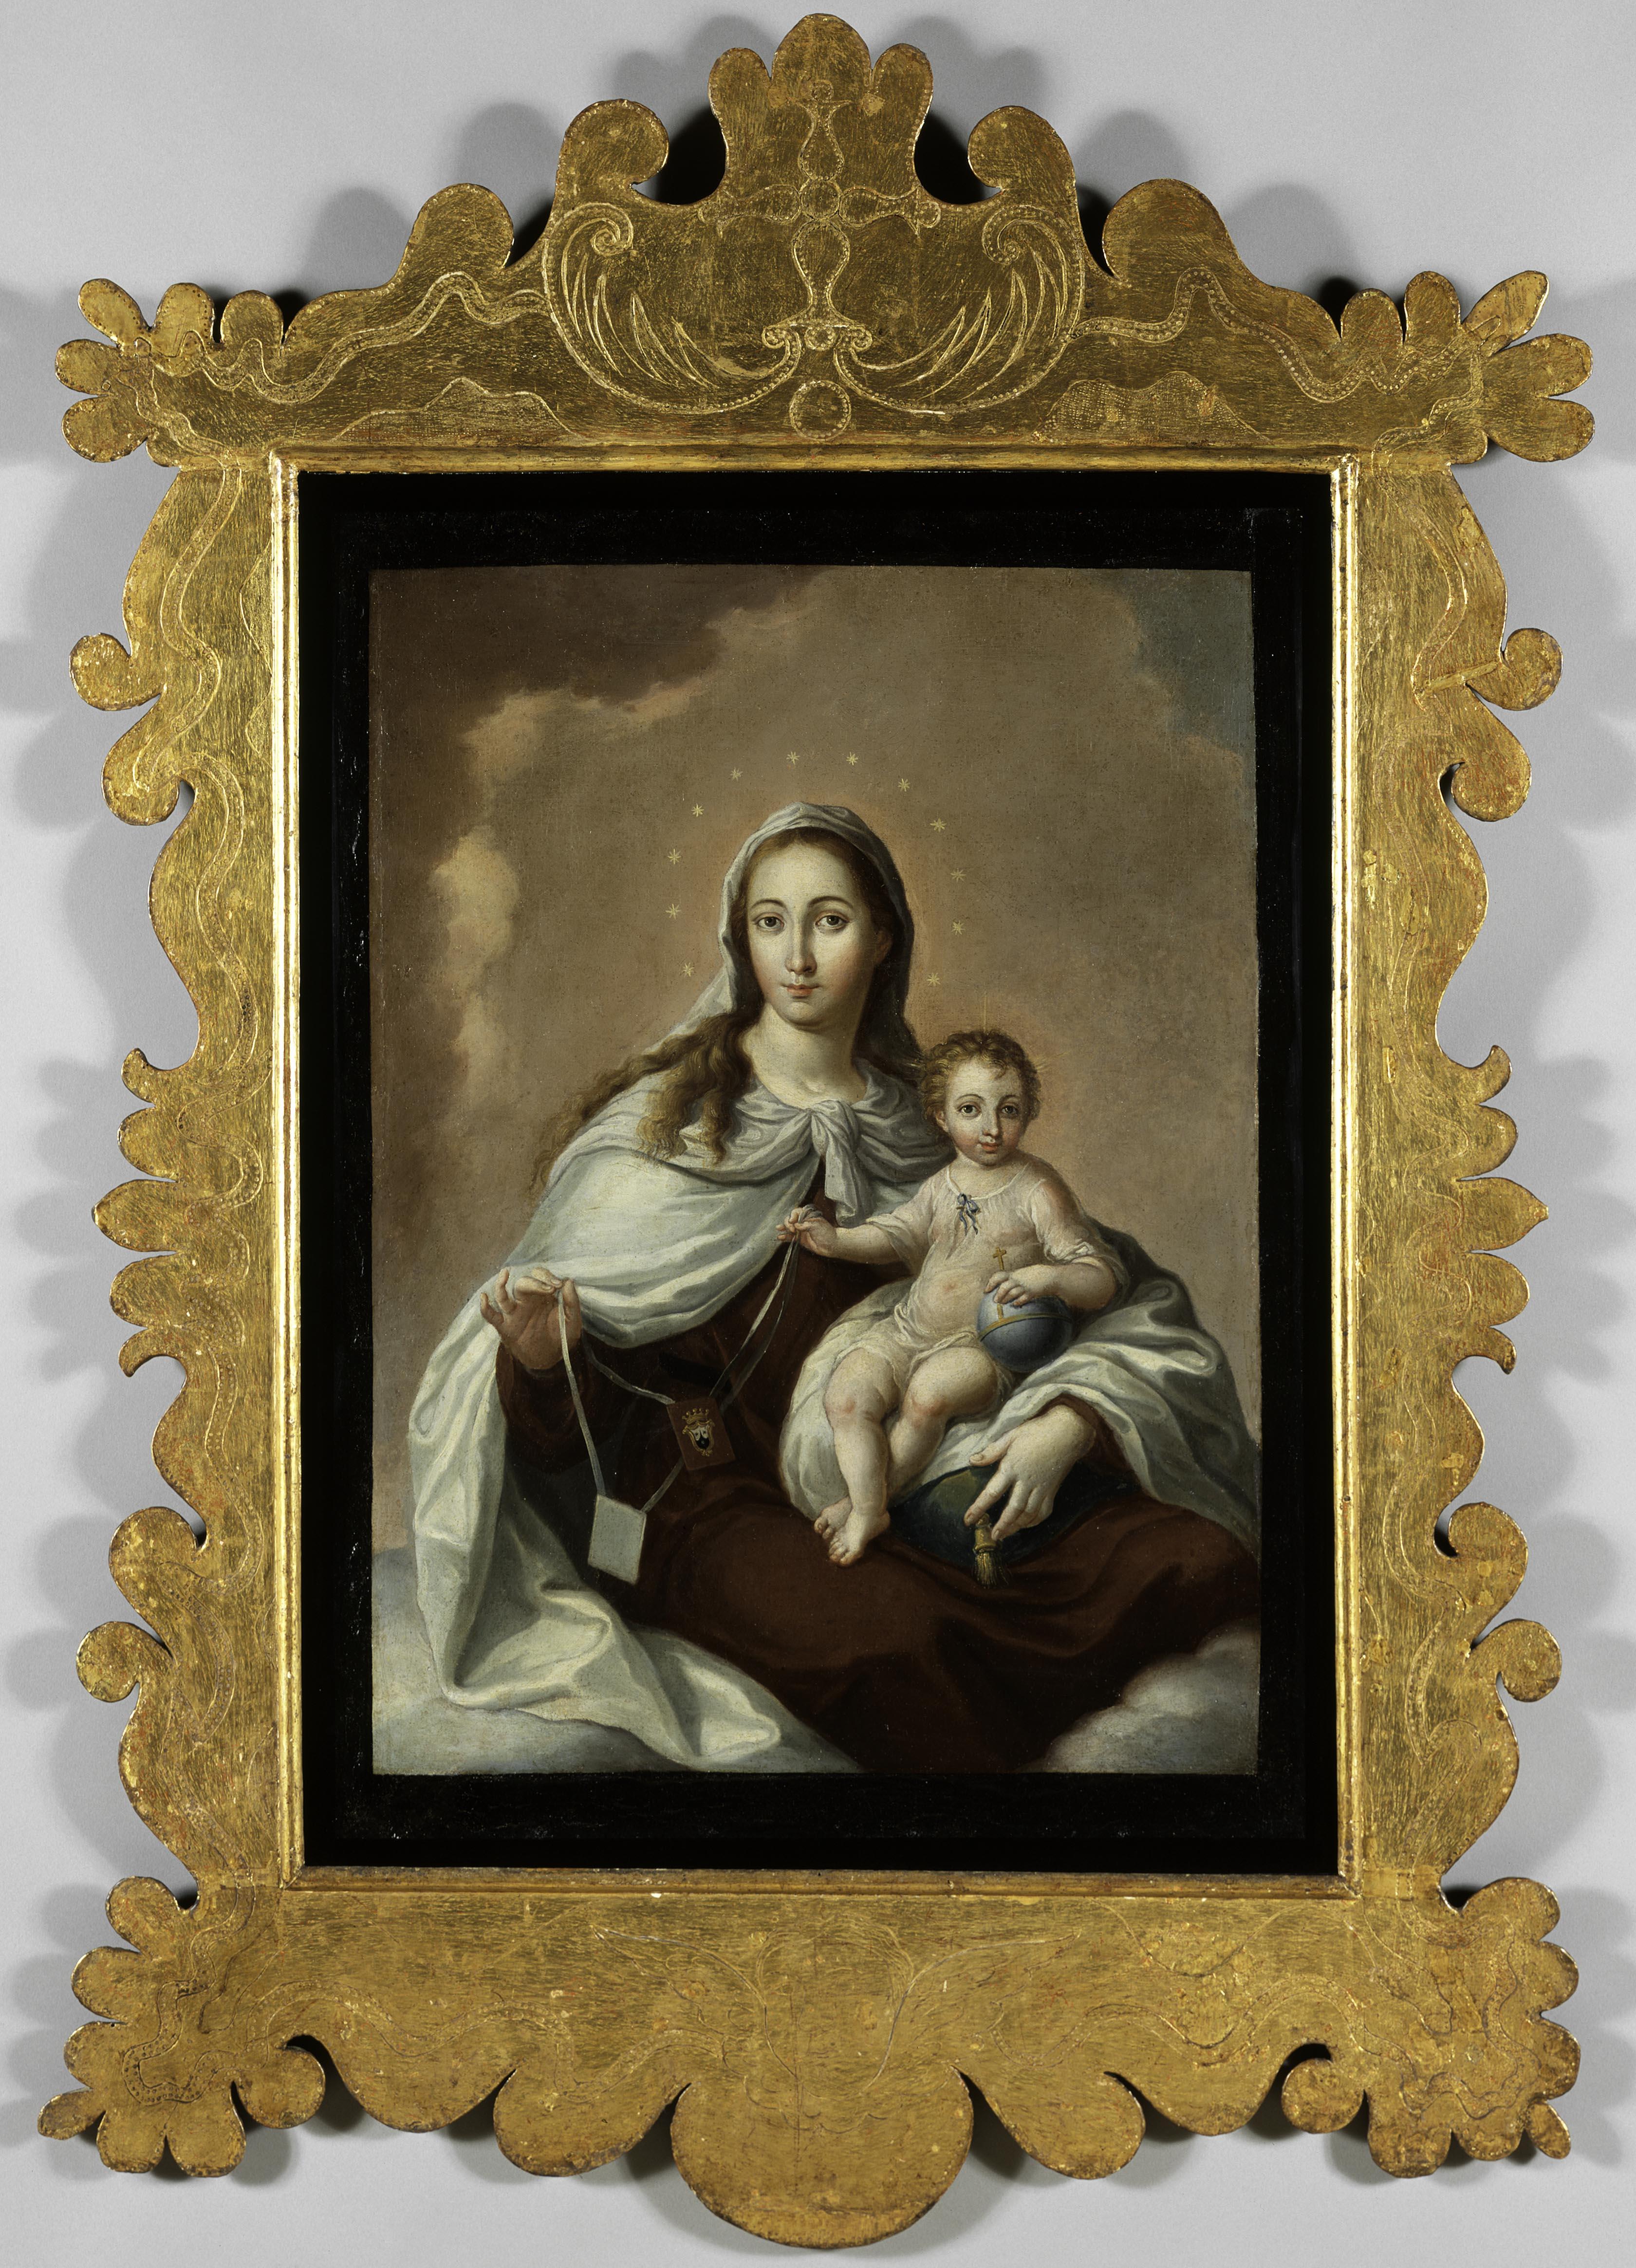 José Campeche (Puerto Rican, 1751–1809), Our Lady of Mount Carmel, 1807, oil on canvas. Courtesy of the Coleccíón Patricia Phelps de Cisneros